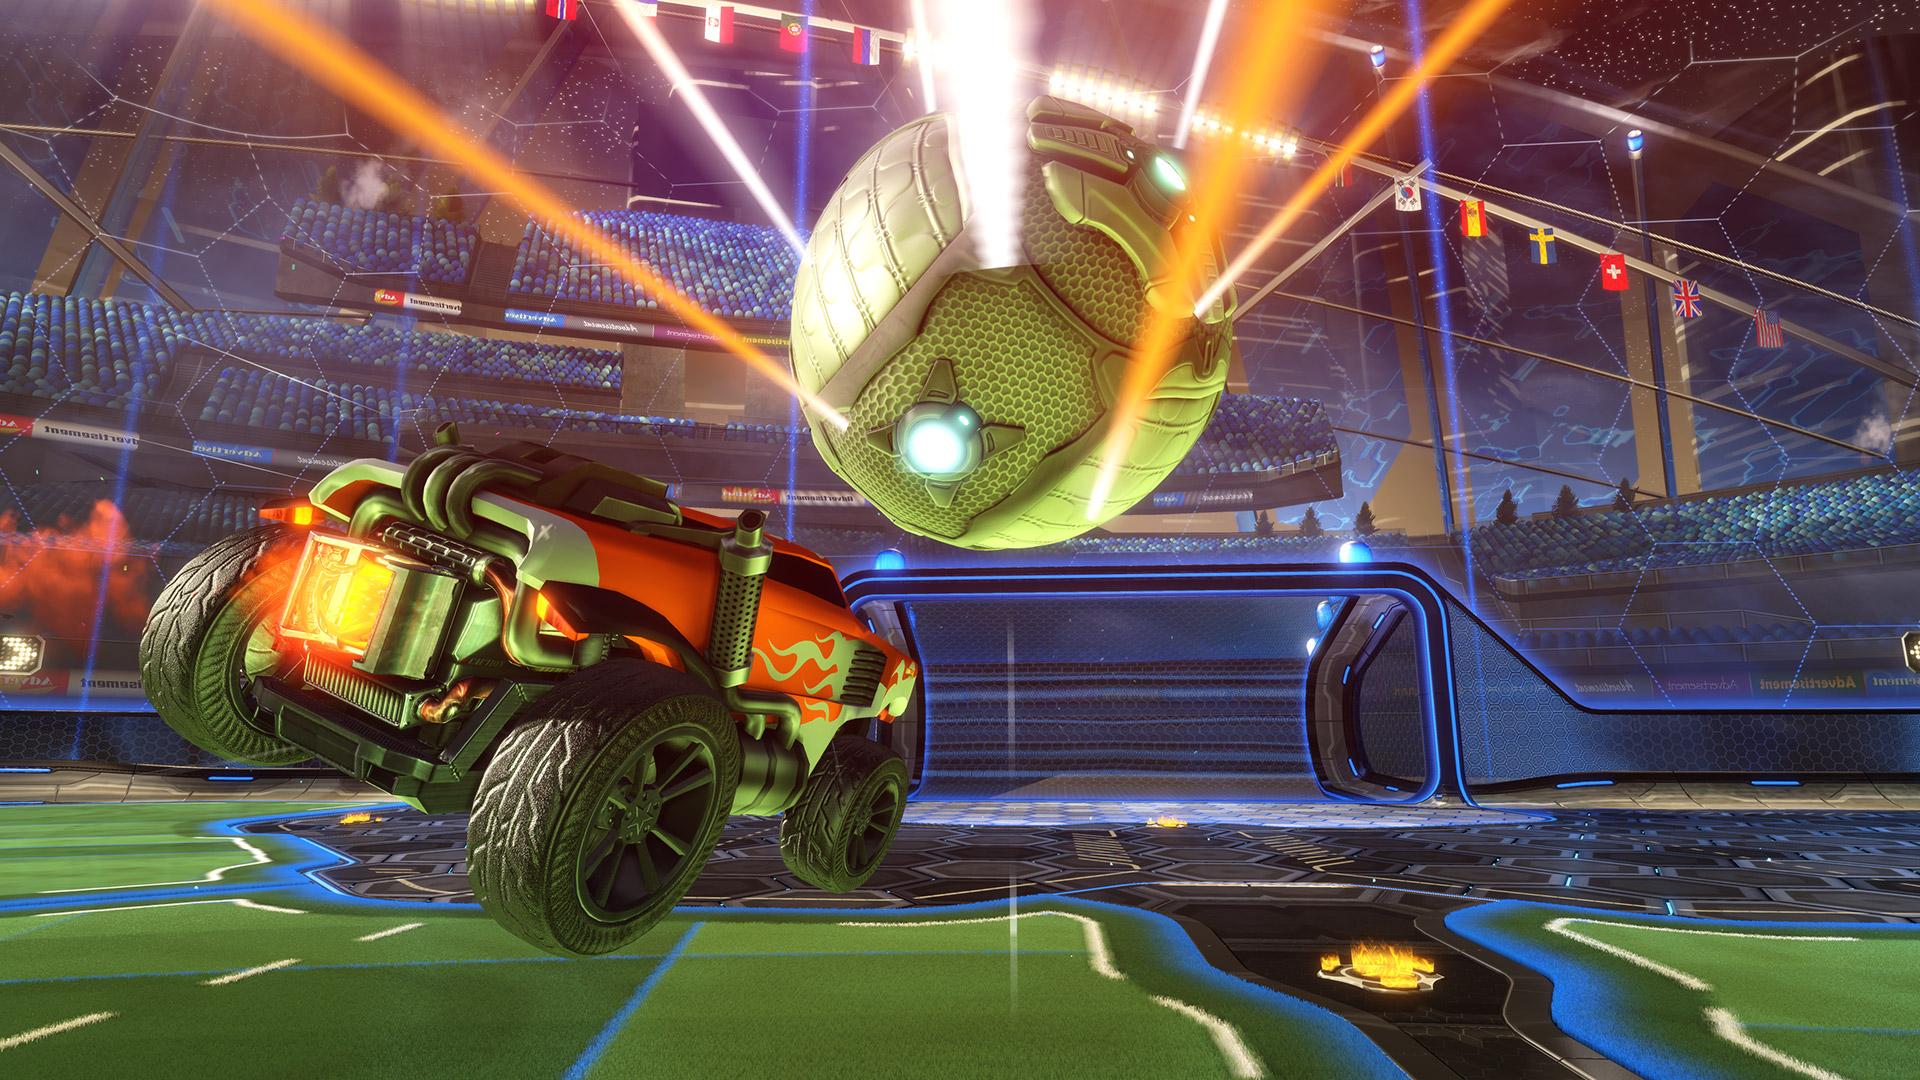 car chasing ball in rocket league